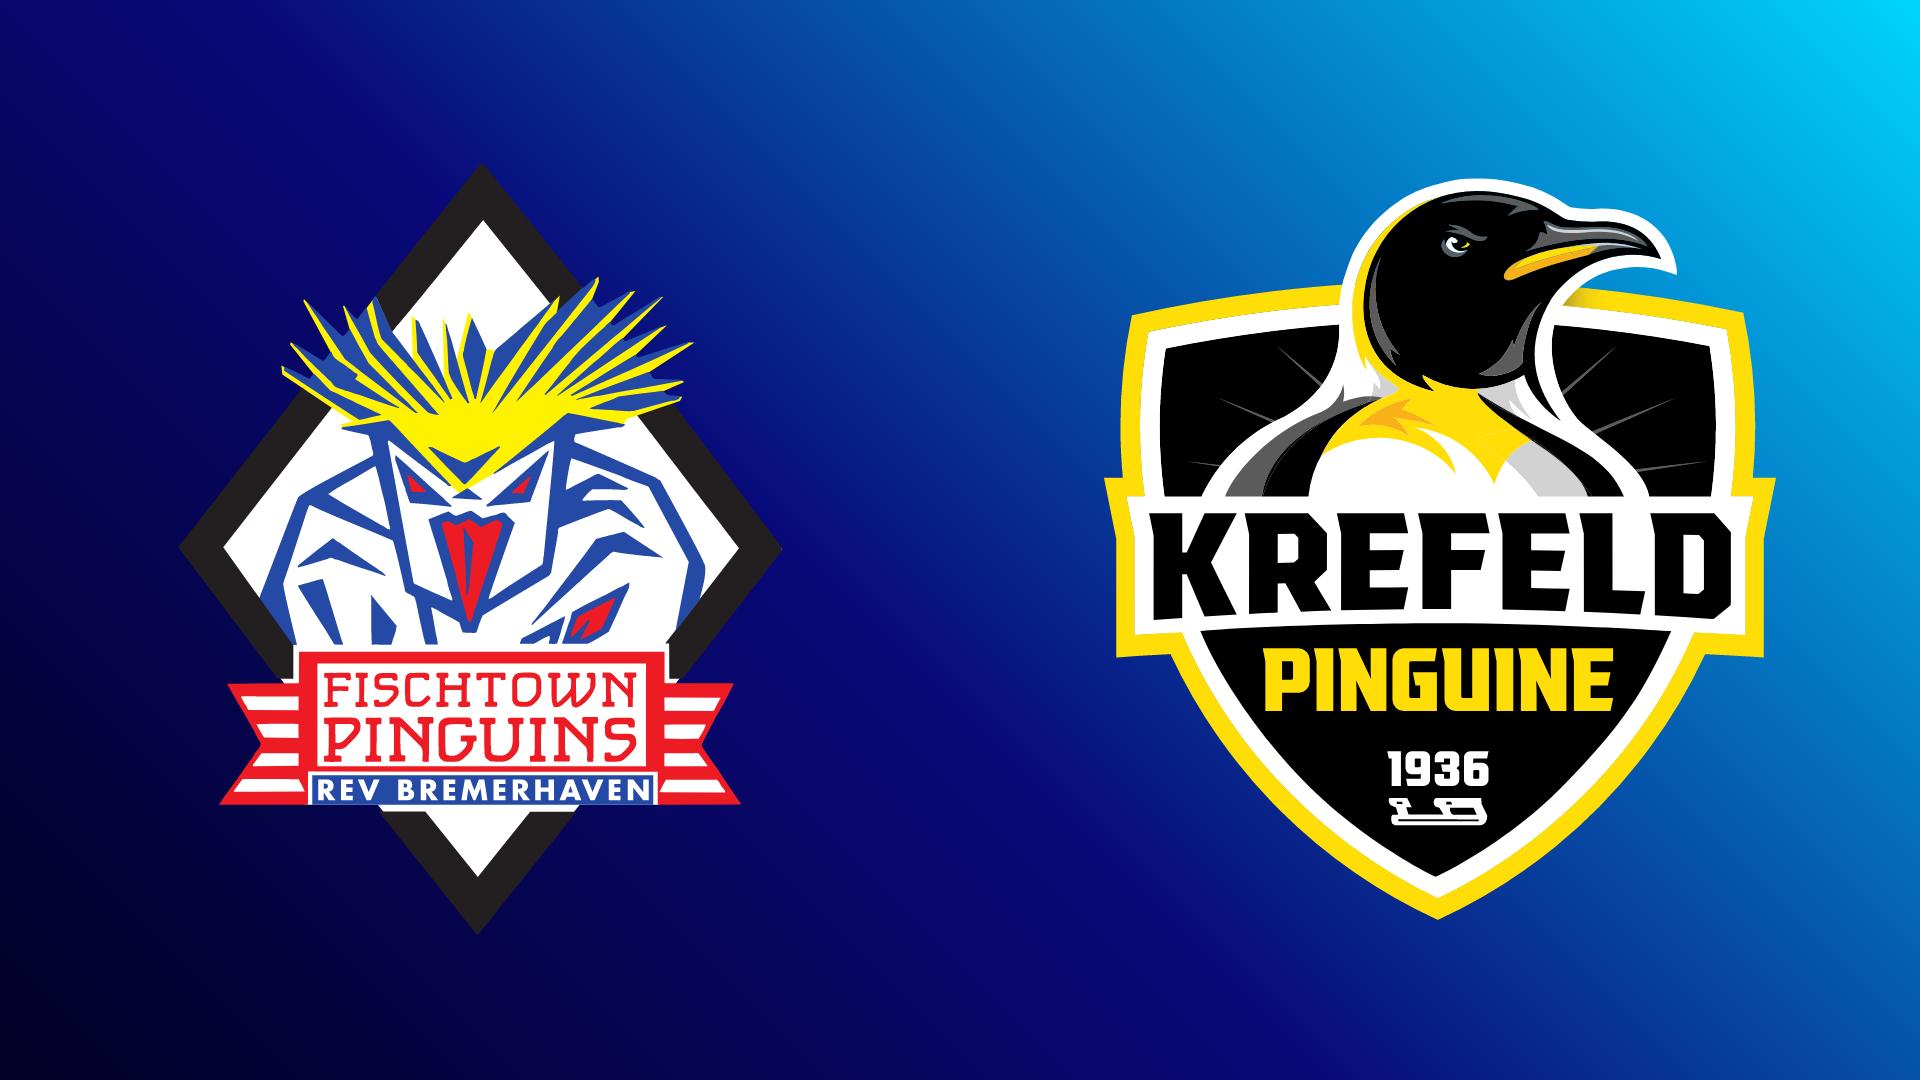 Pinguins Bremerhaven - Krefeld Pinguine 22.10.2021 um 19:00 Uhr auf Magenta Sport